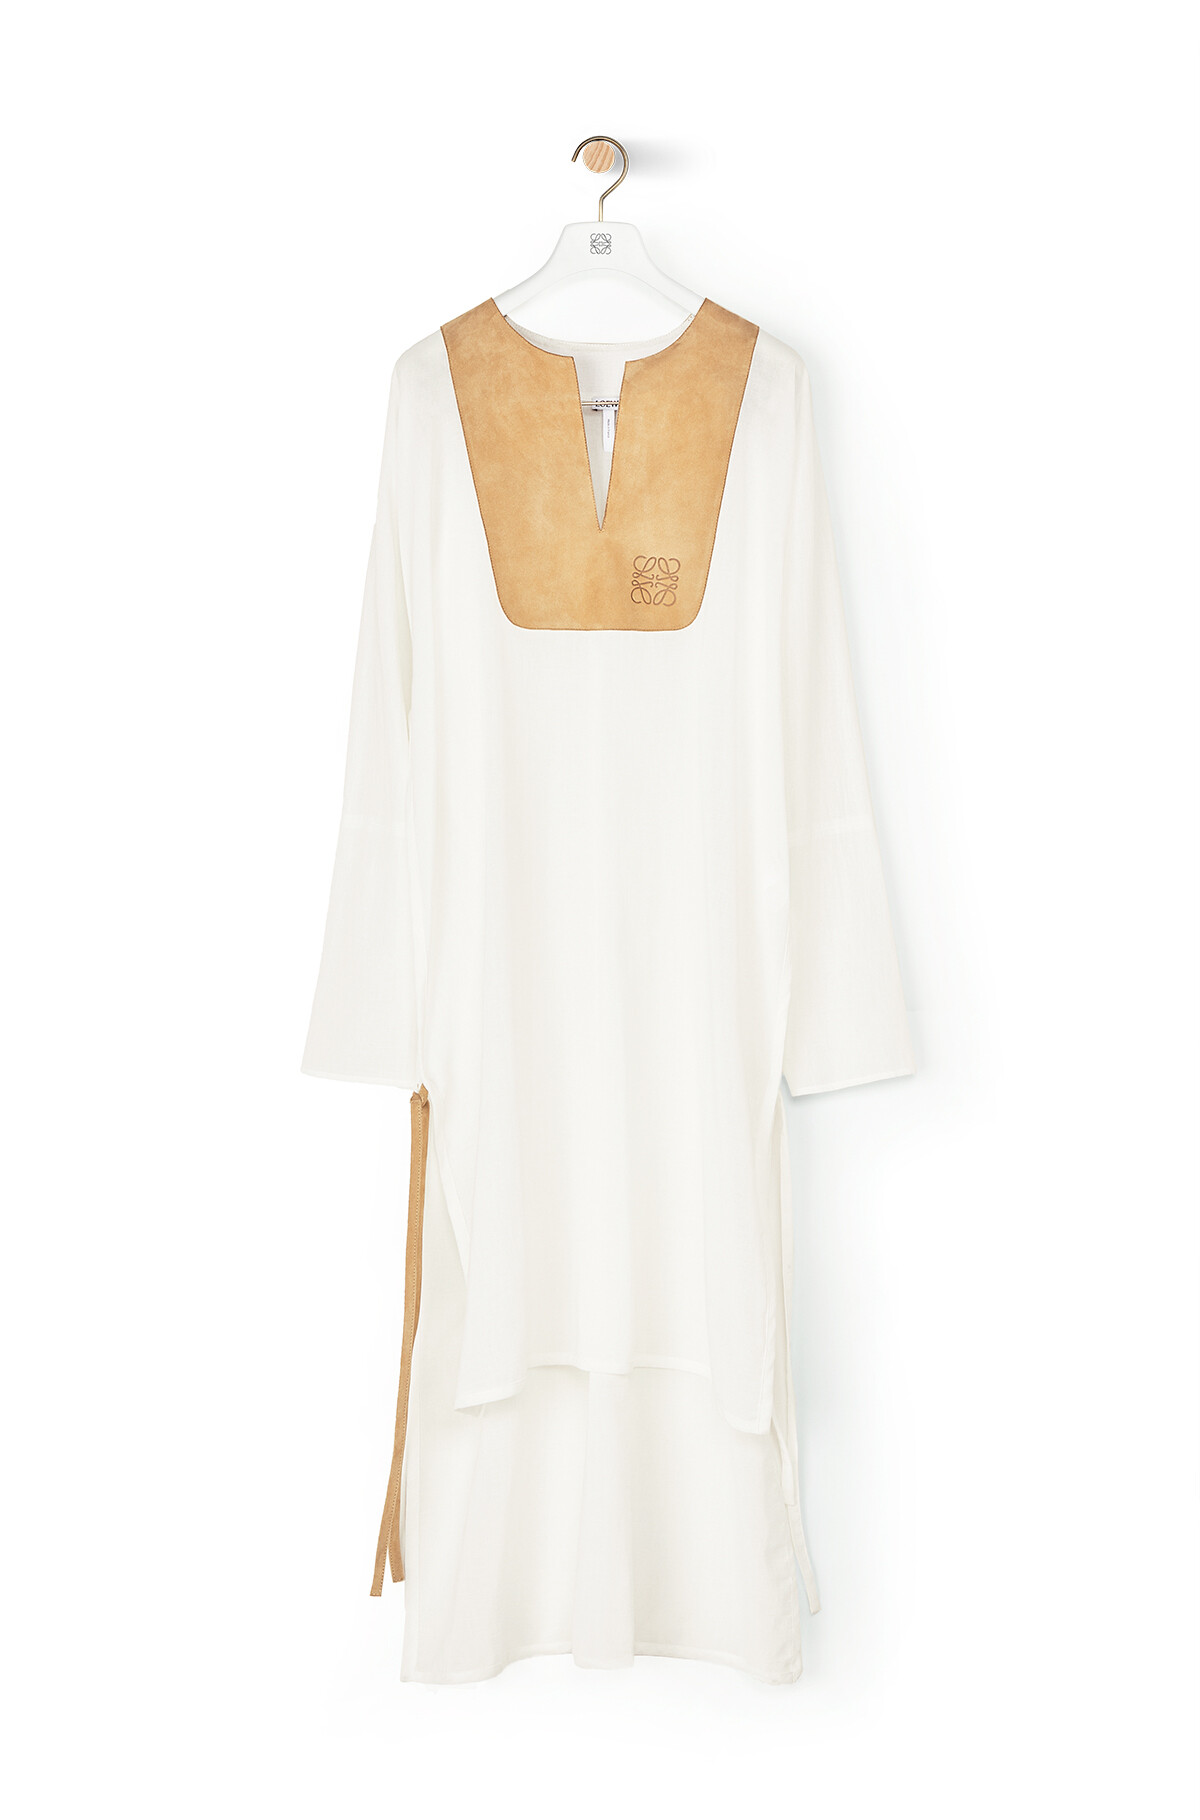 LOEWE Tunic Dress Suede Bib White/Beige front